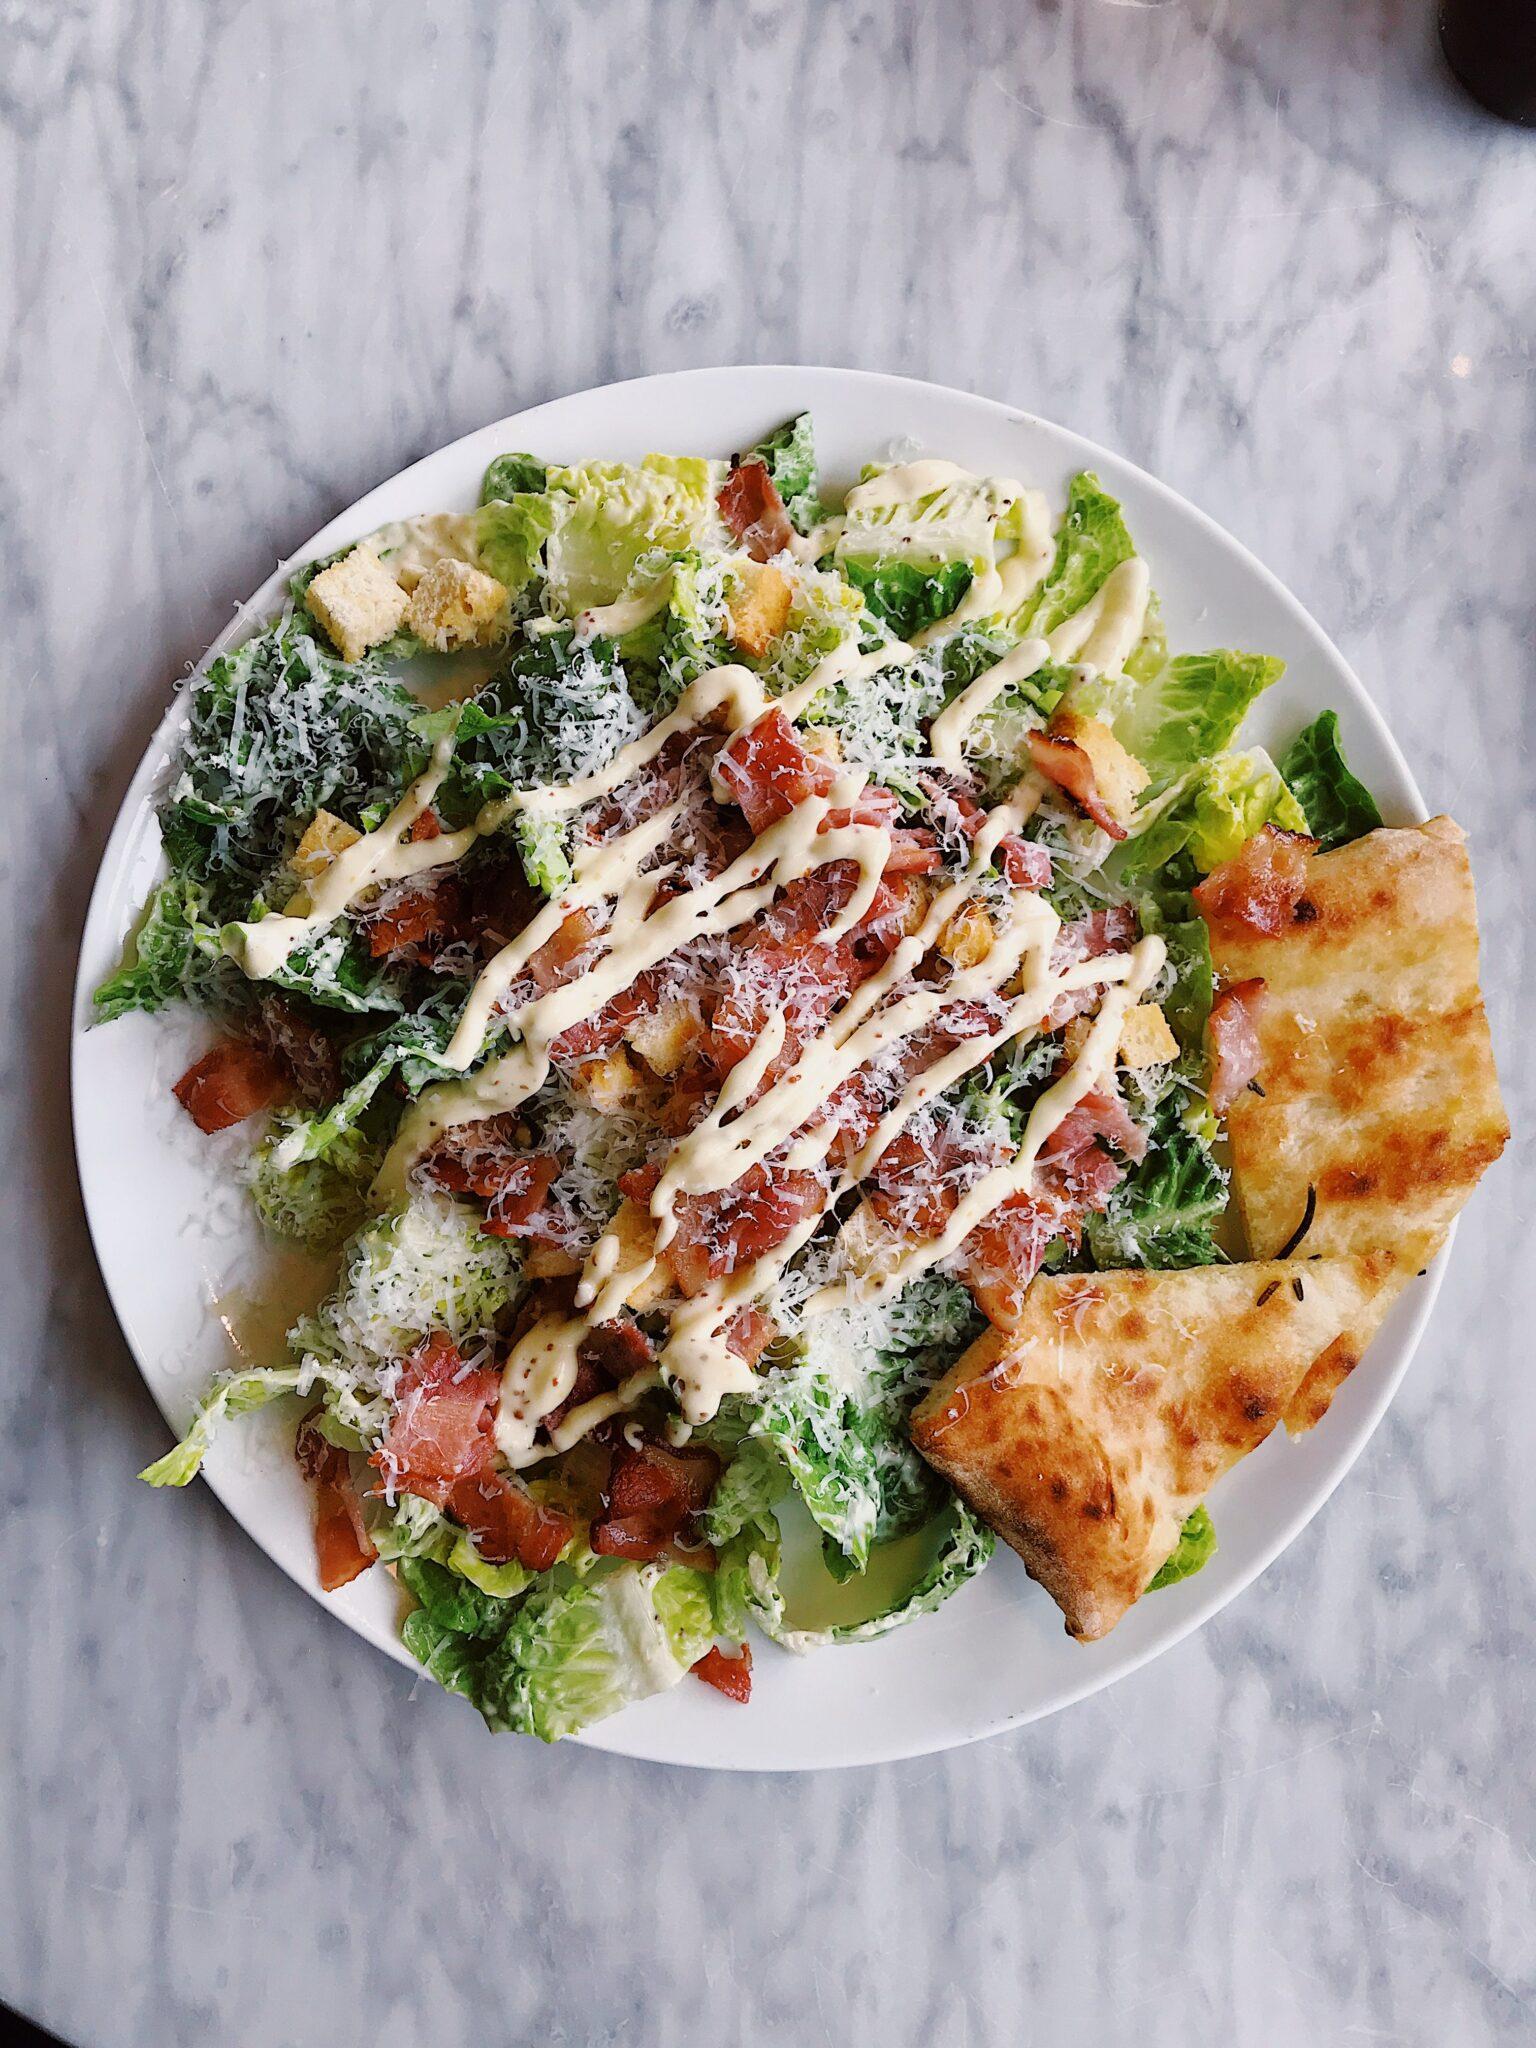 Salade Speelman & Speel Pexelsman